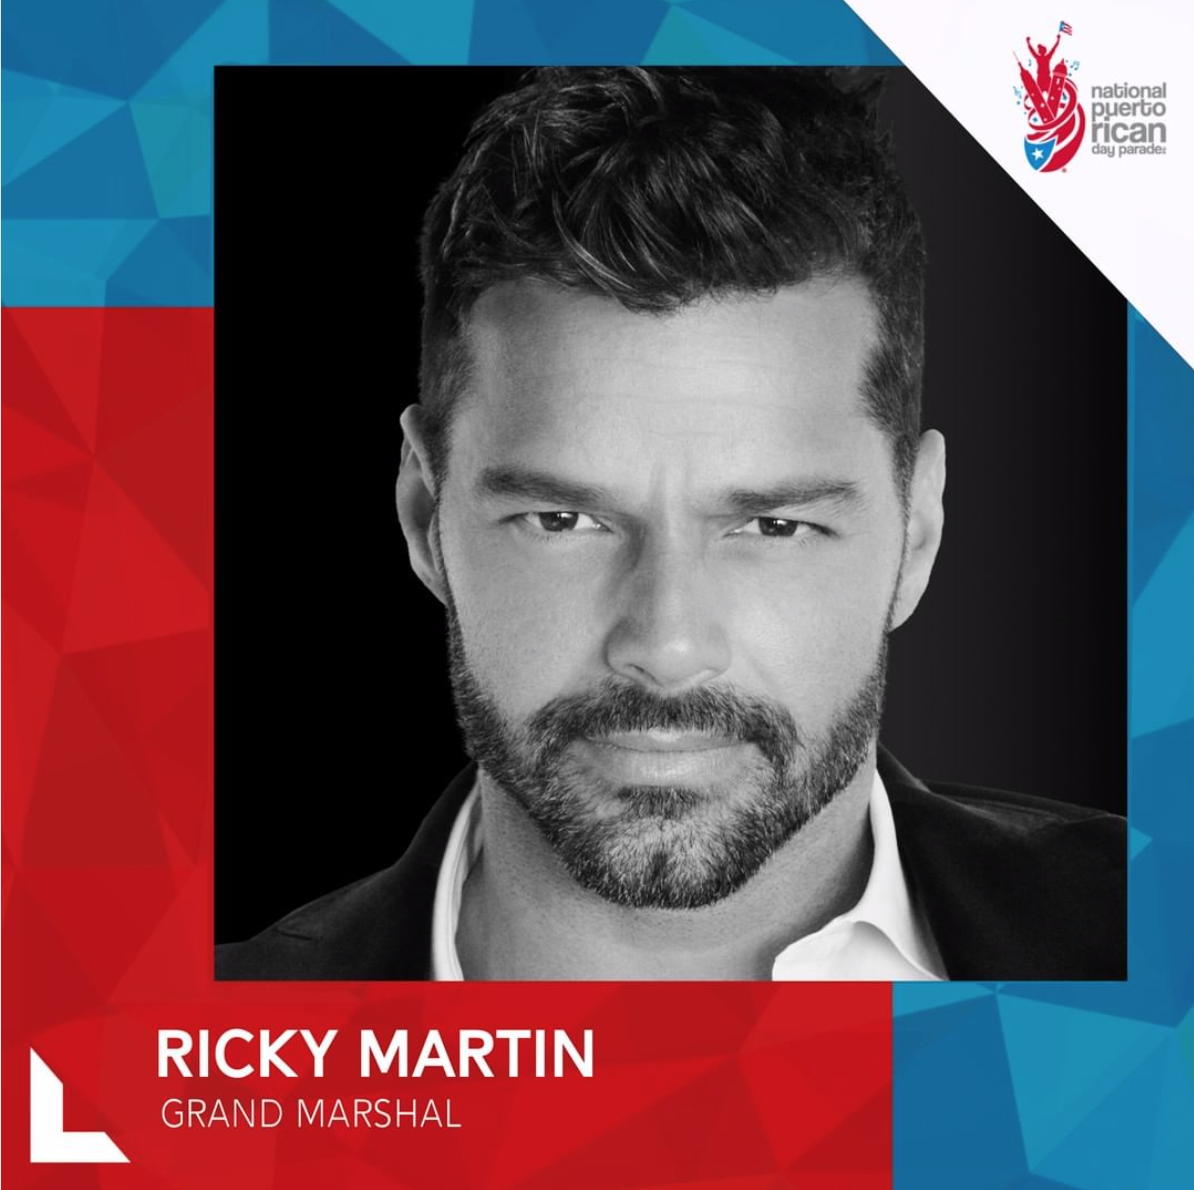 Ricky Martin Grand Marshal